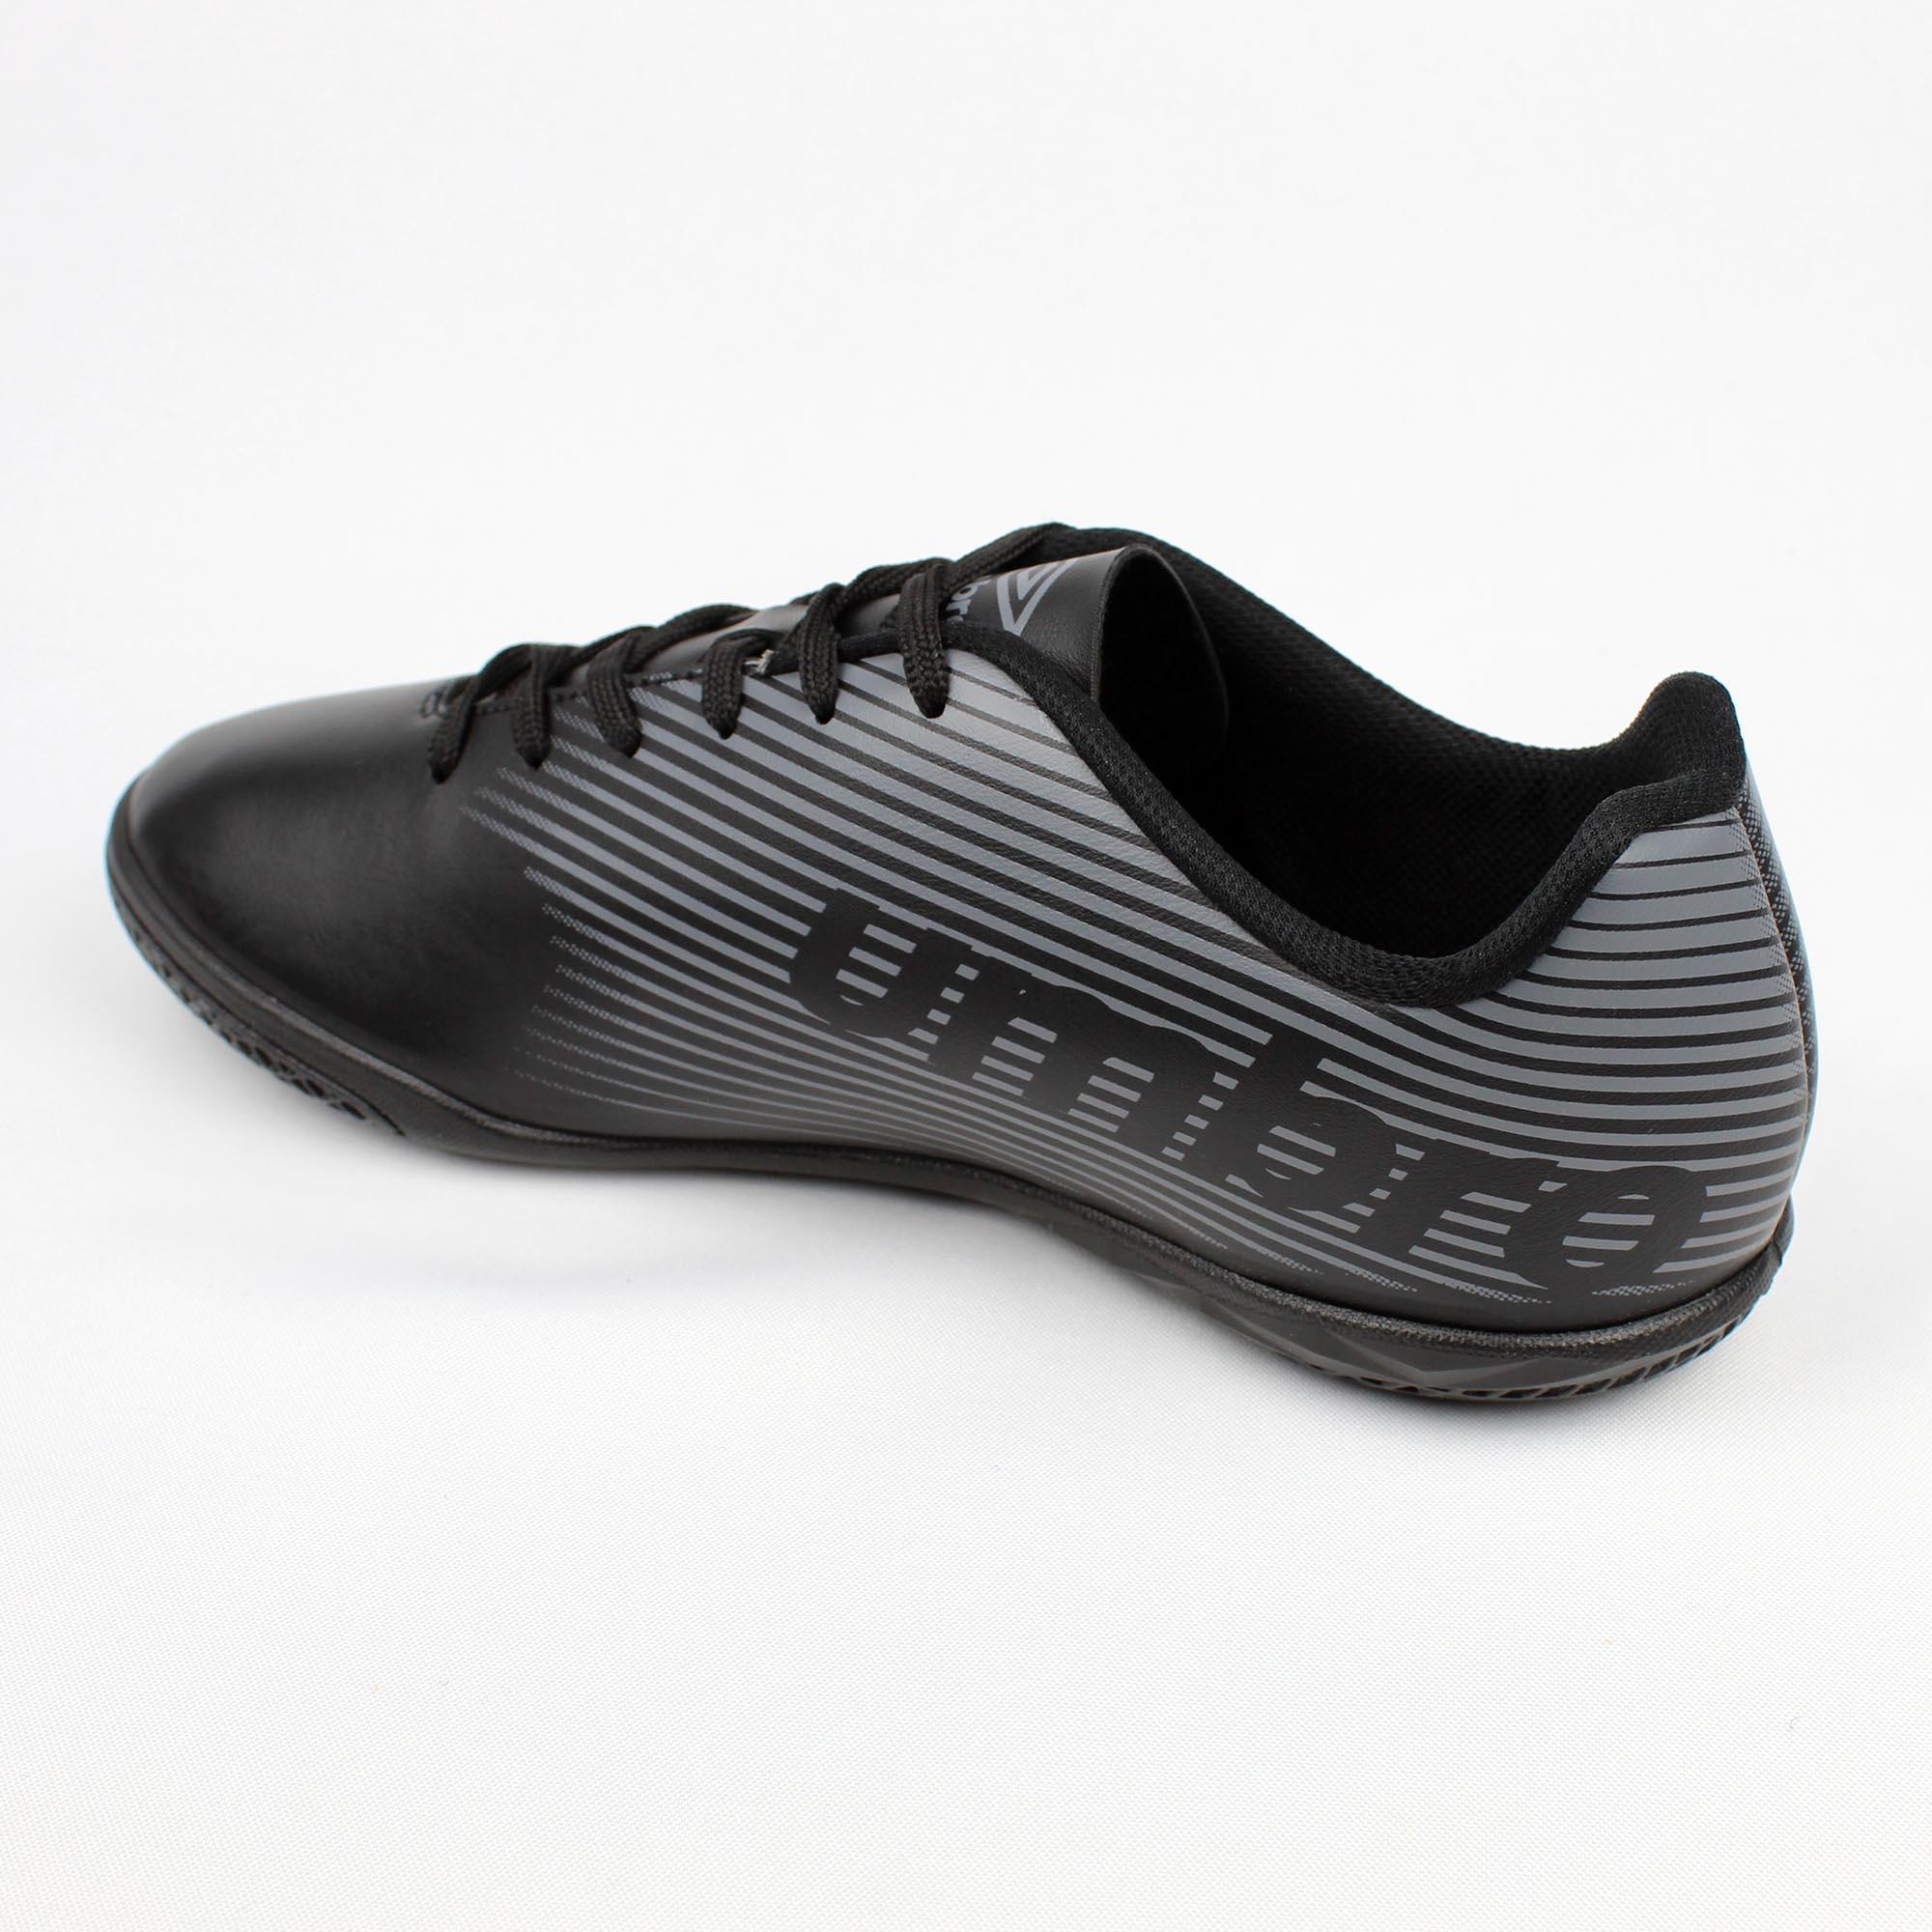 Tênis Masculino Futsal Umbro F5 Light